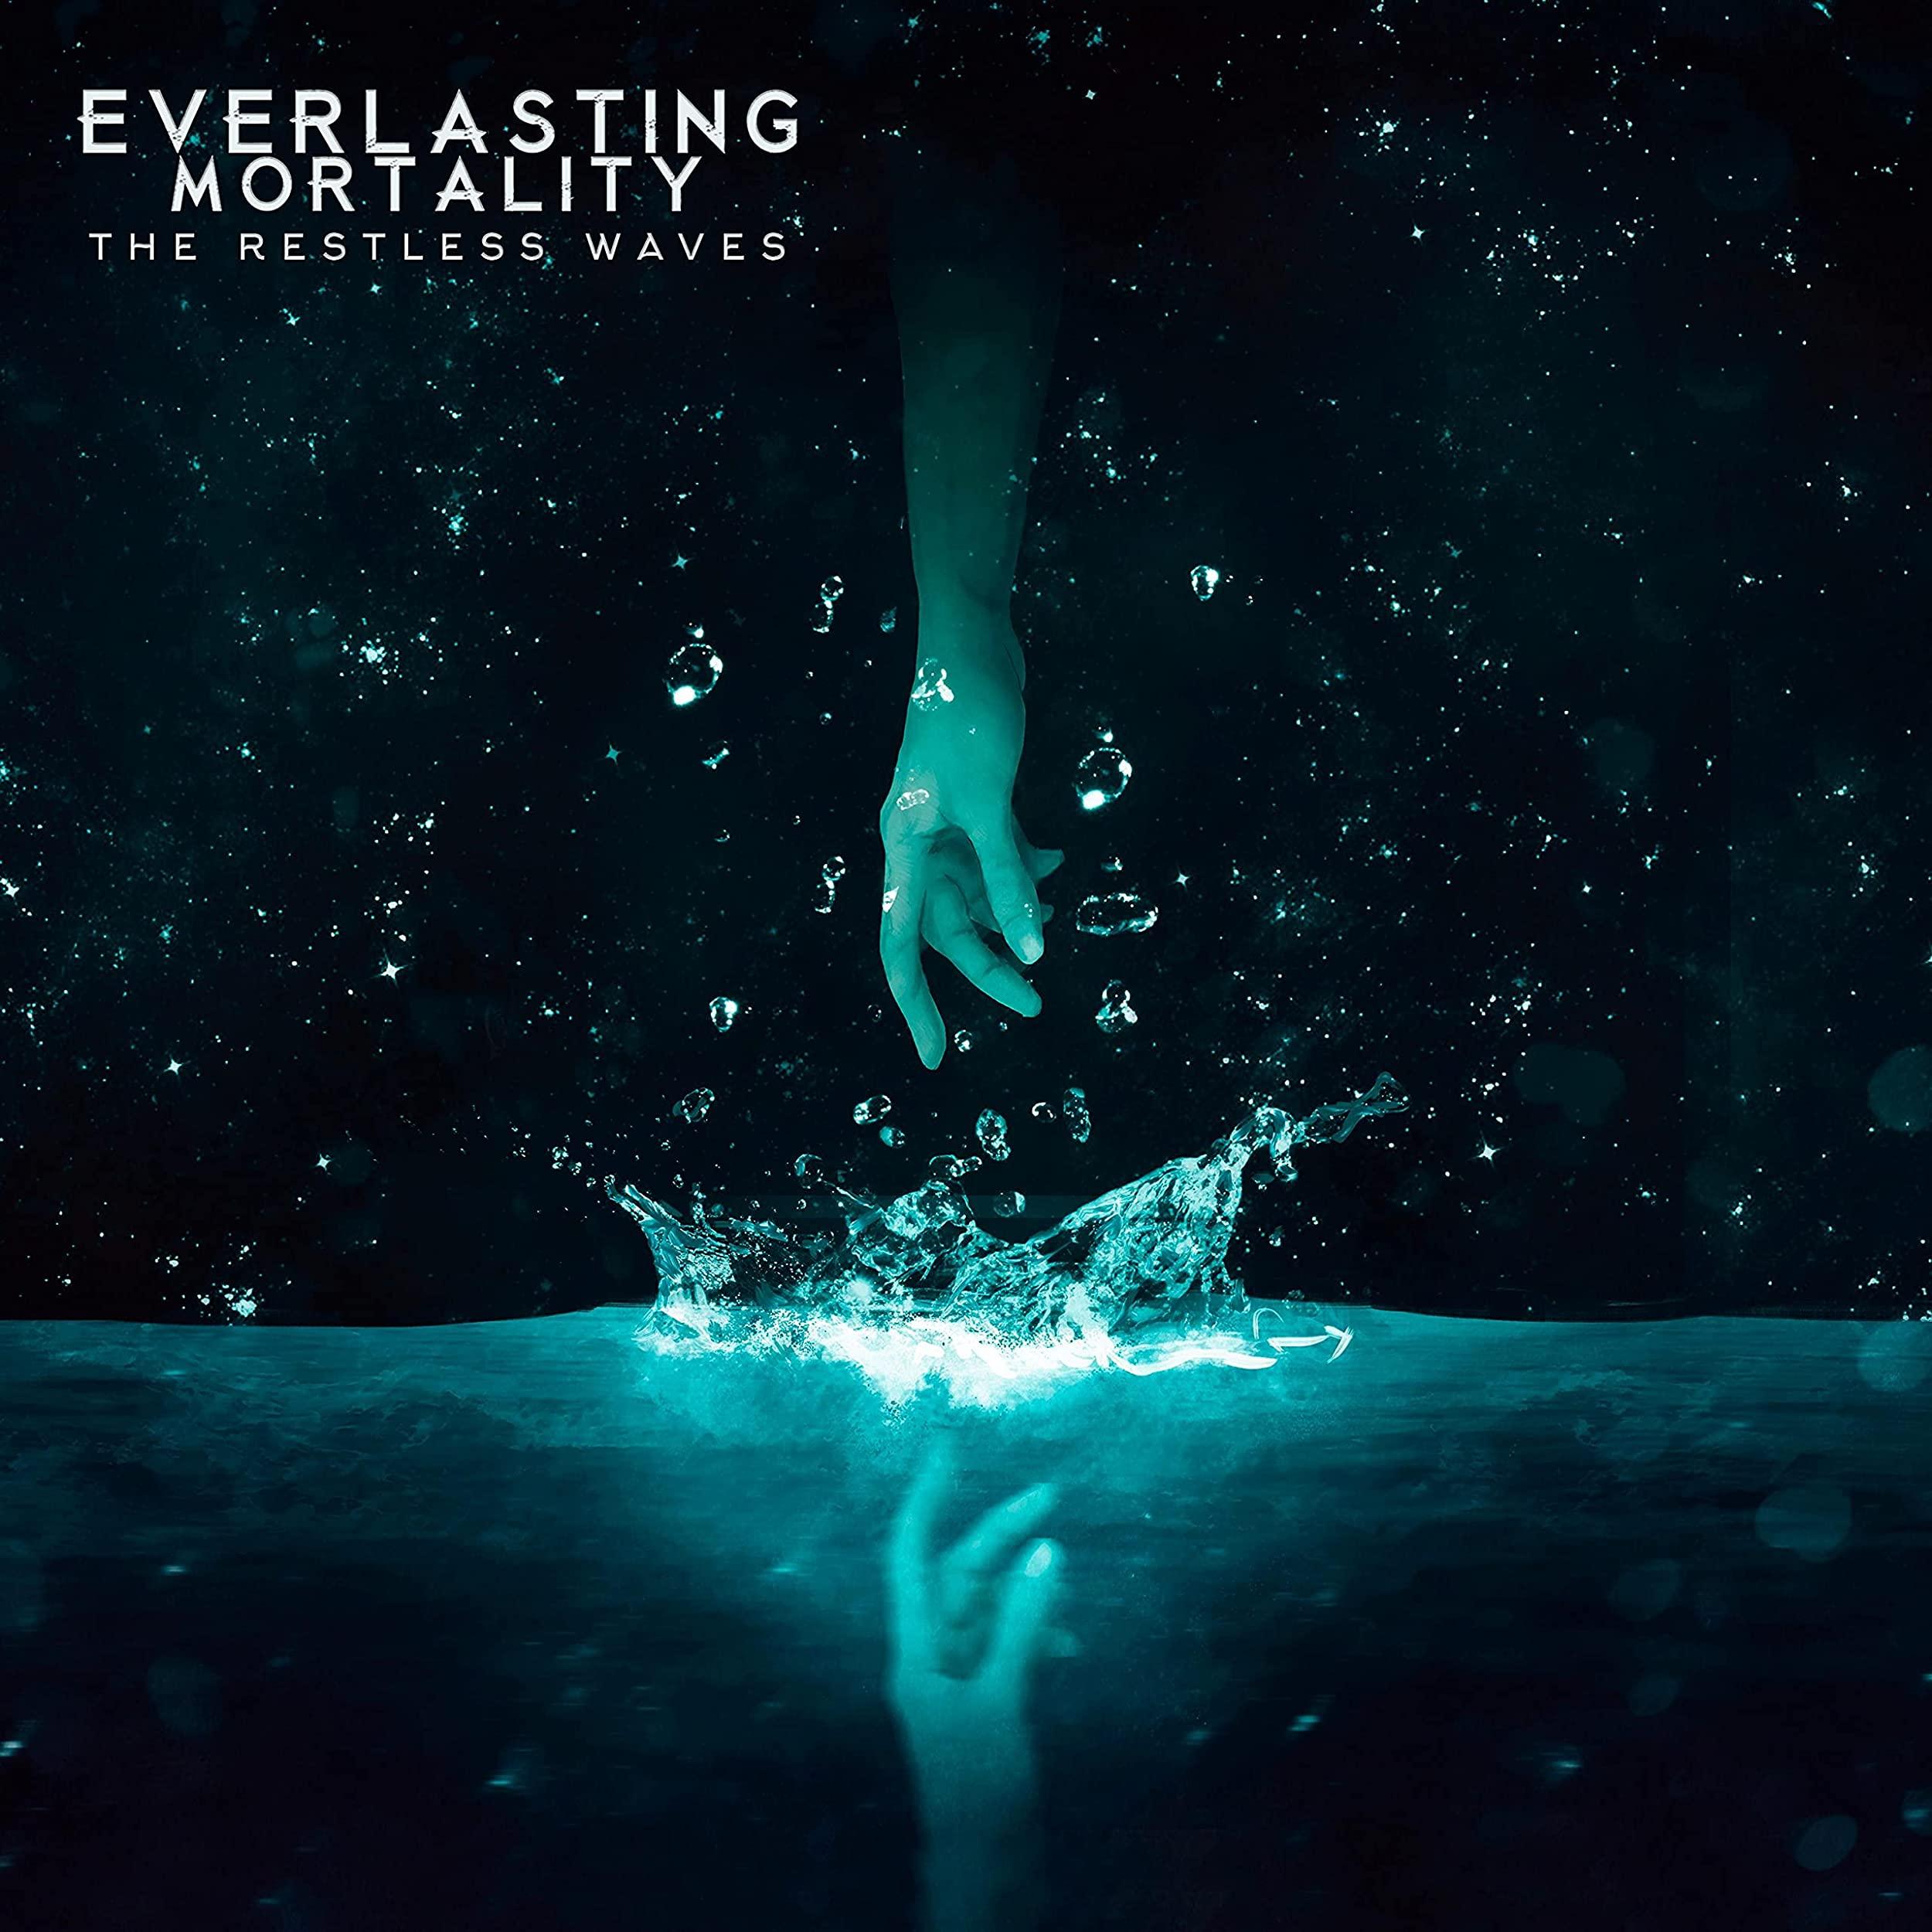 Everlasting Mortality - The Restless Waves (2021)